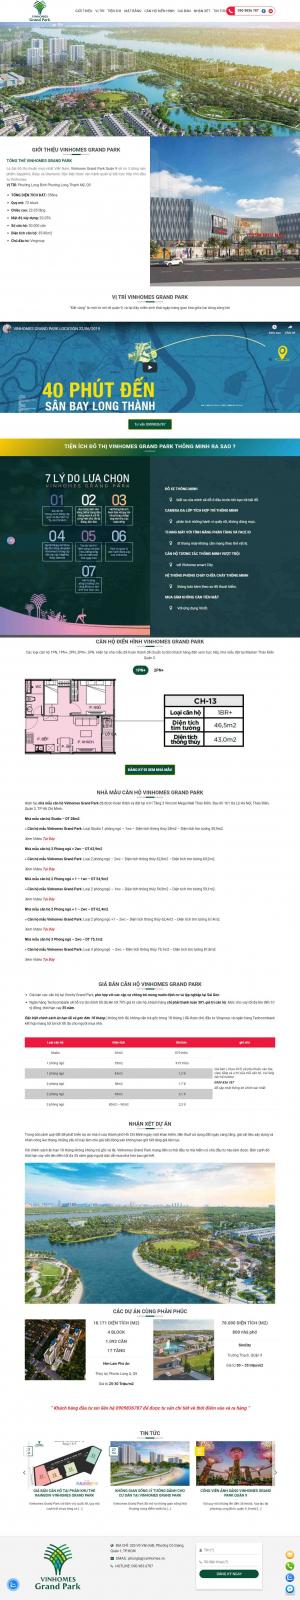 Mẫu giao diện thiết kế web landing page bds